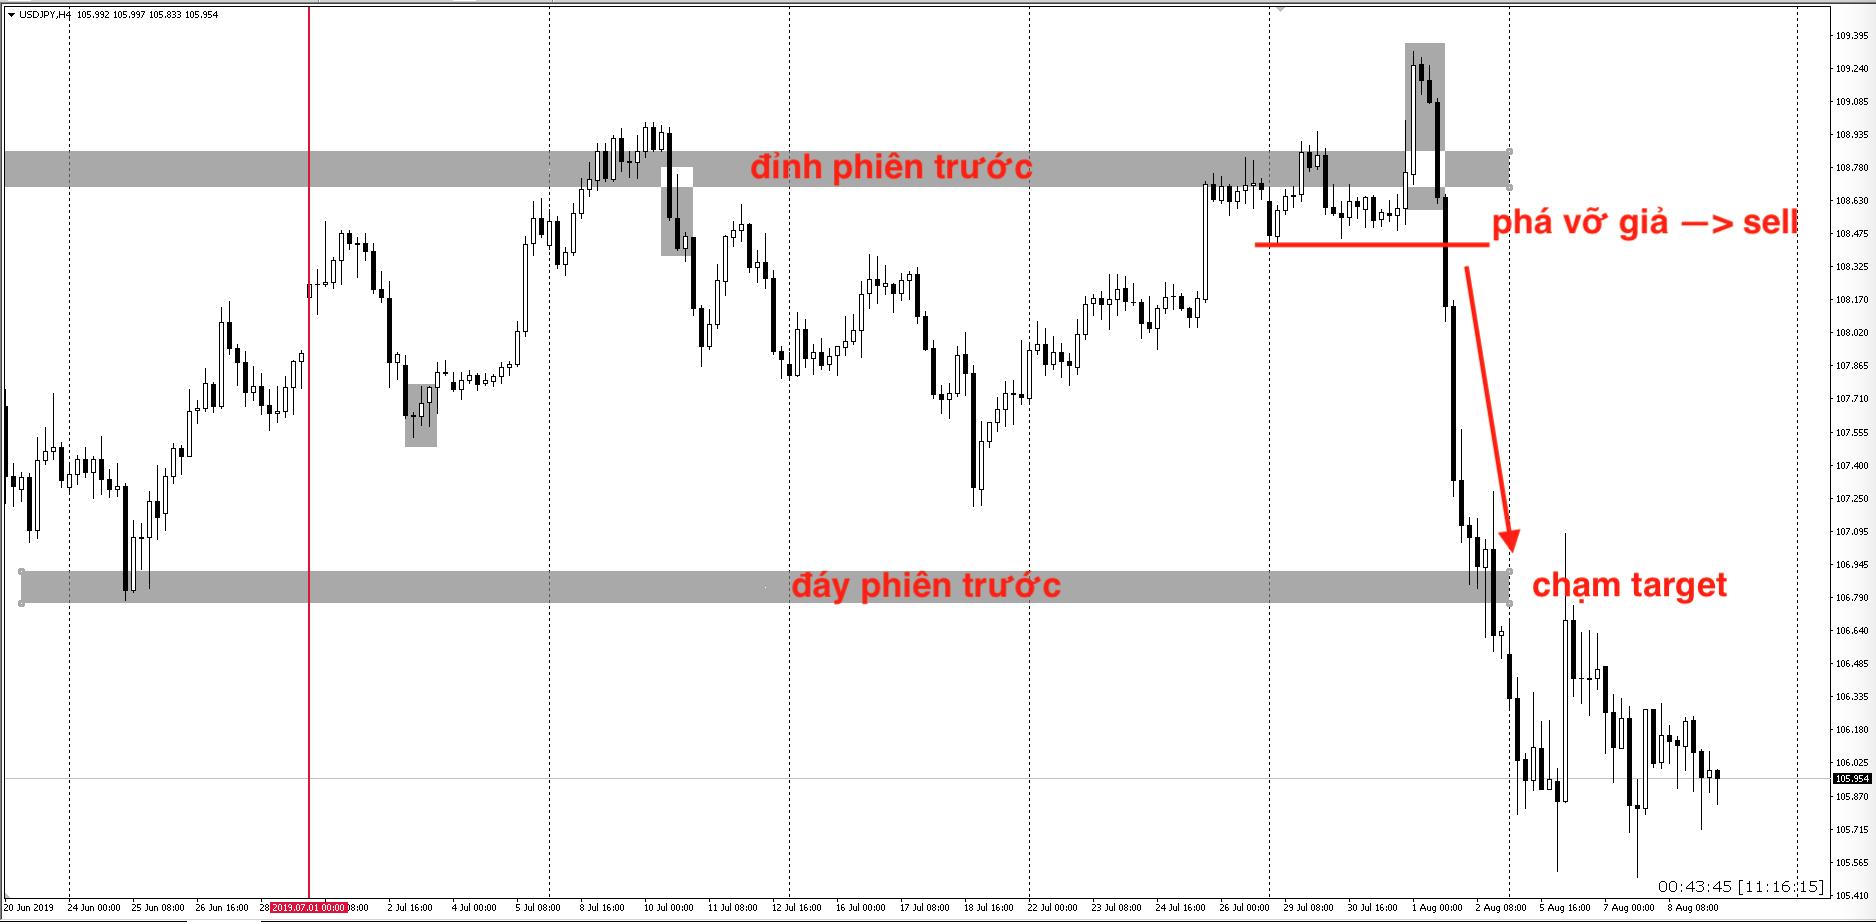 lance-beggs-price-action-traderviet2.